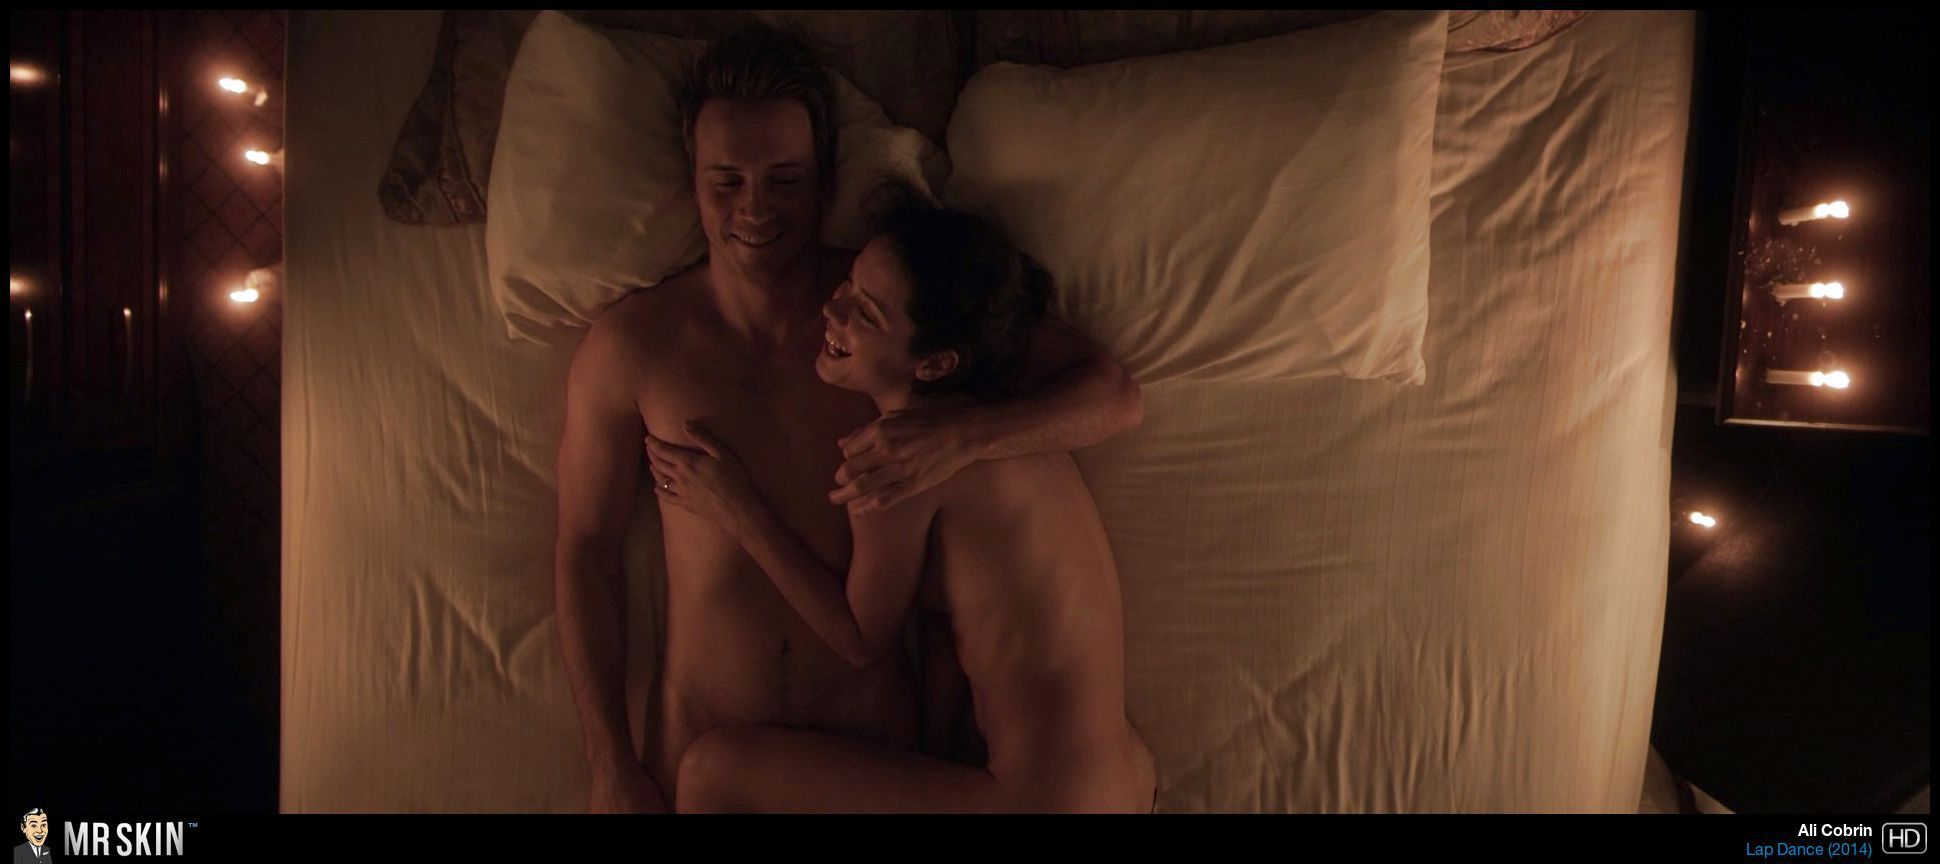 Kd aubert nude scene me, please